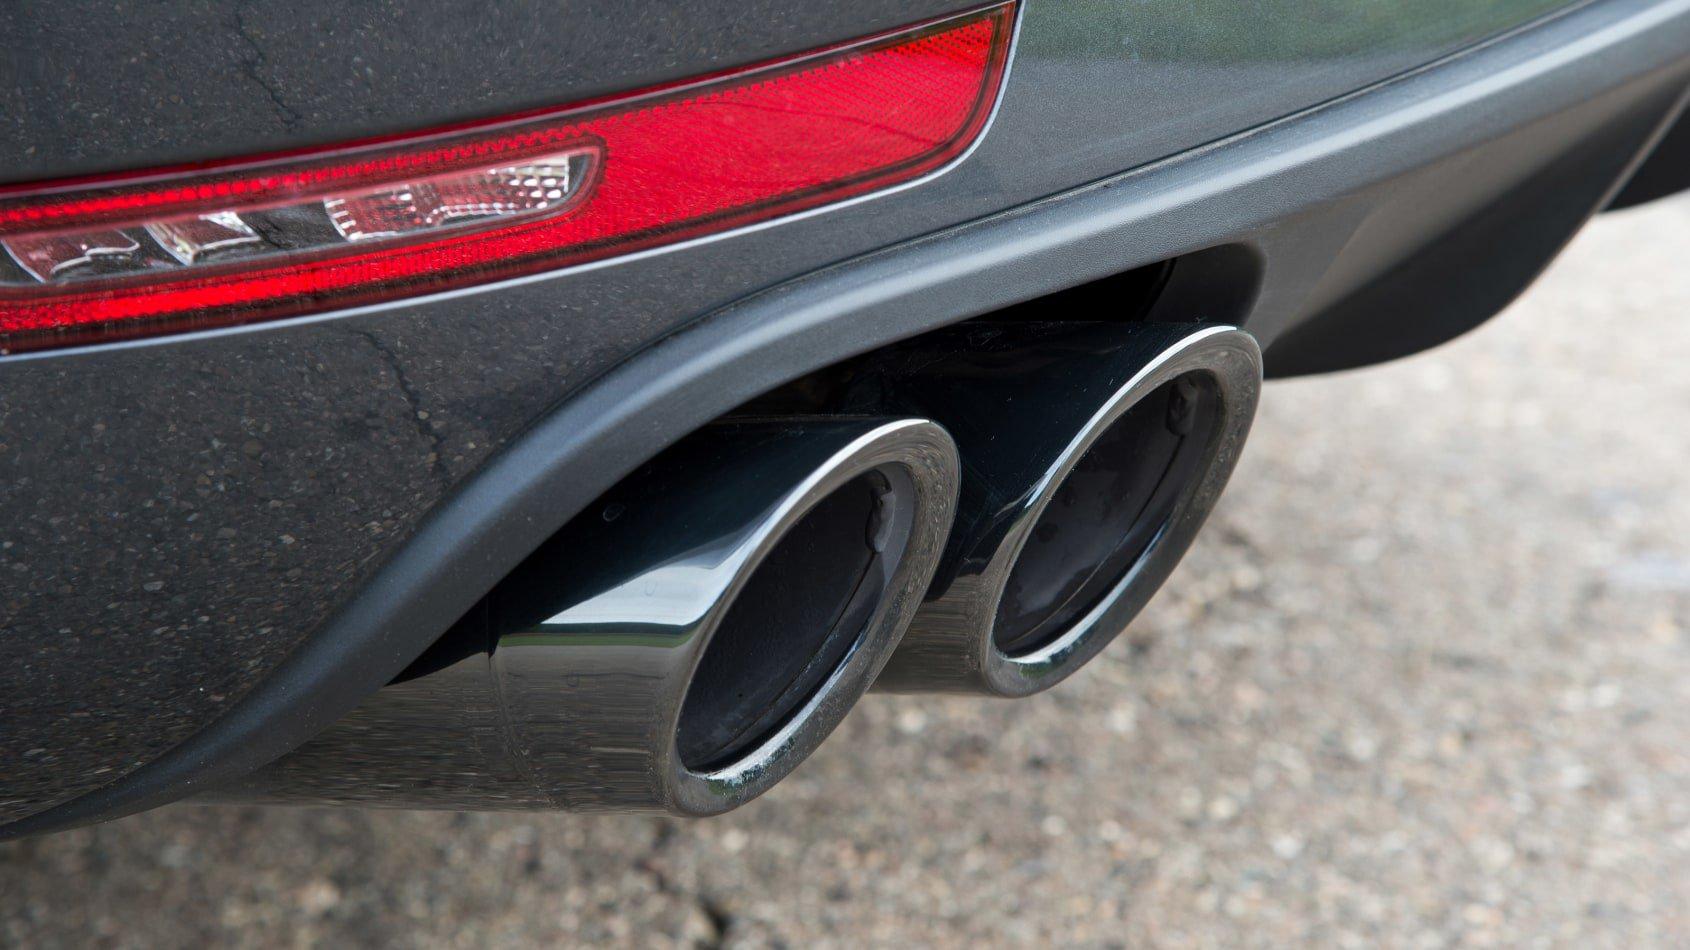 2020 Porshce Macan Turbo exhausts